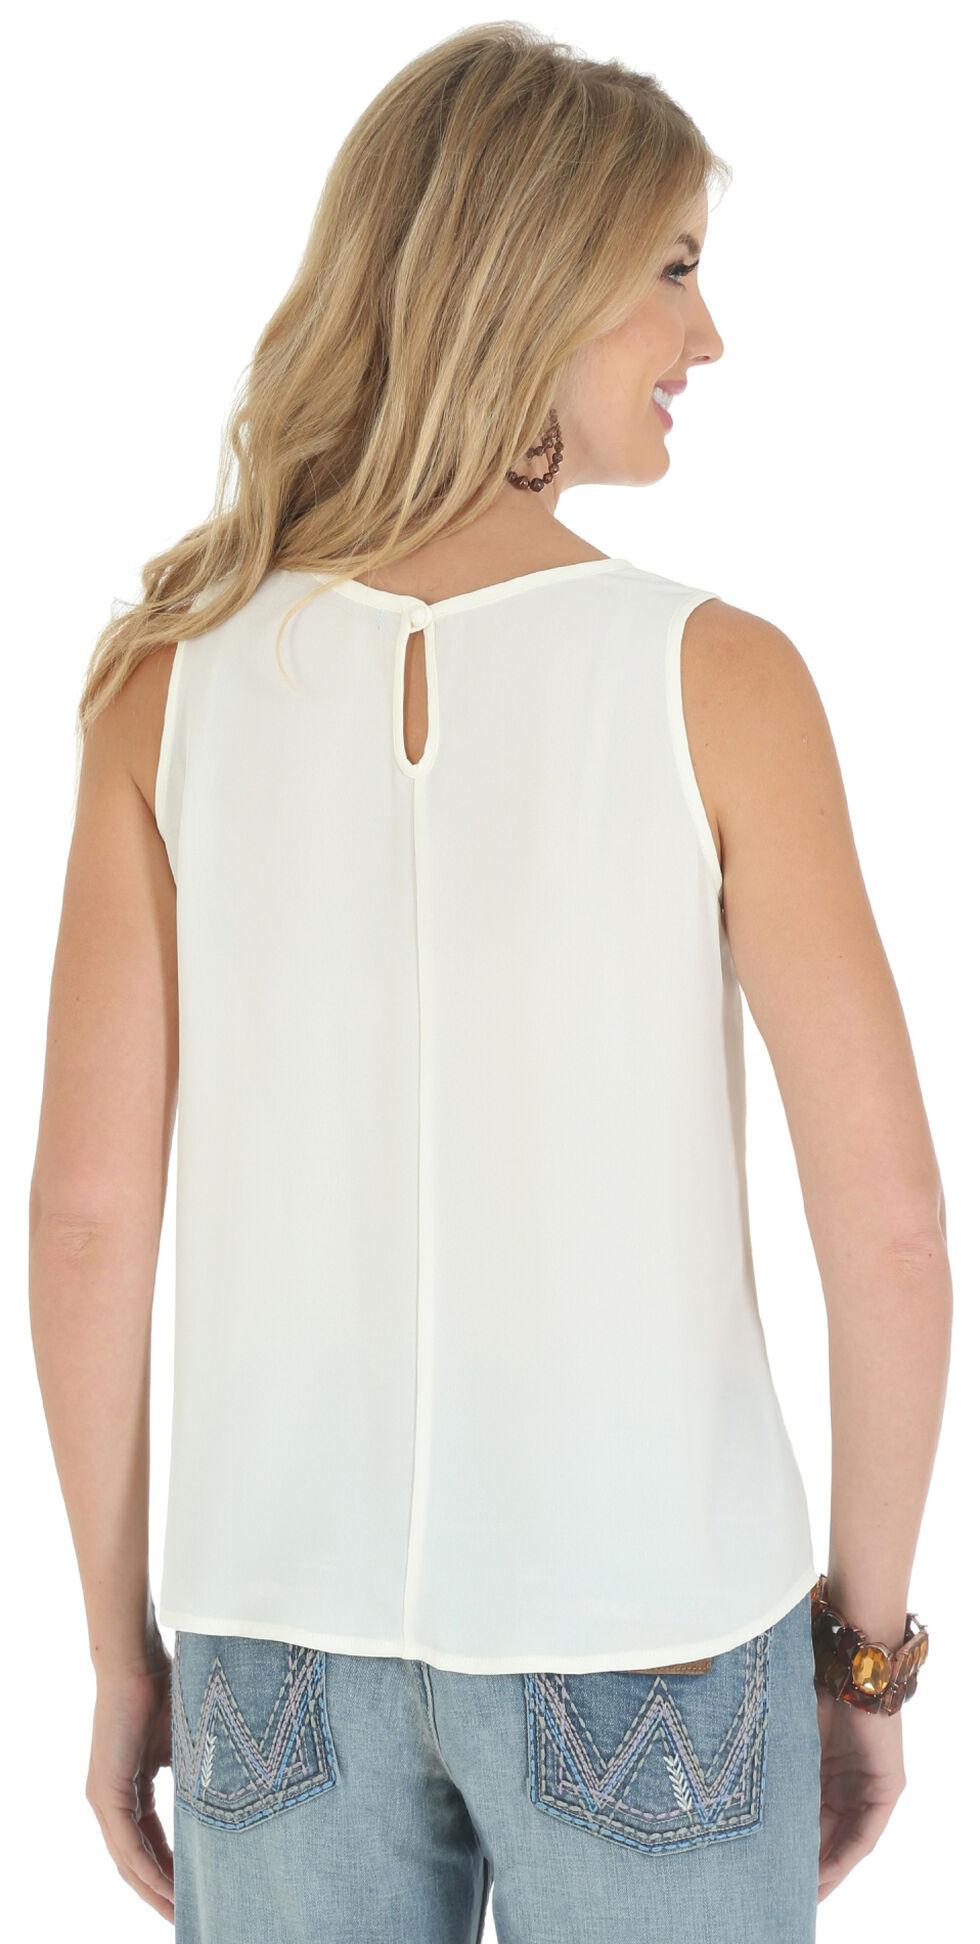 Wrangler Women's Sleeveless Embroidered Tape Shirt, Vanilla, hi-res